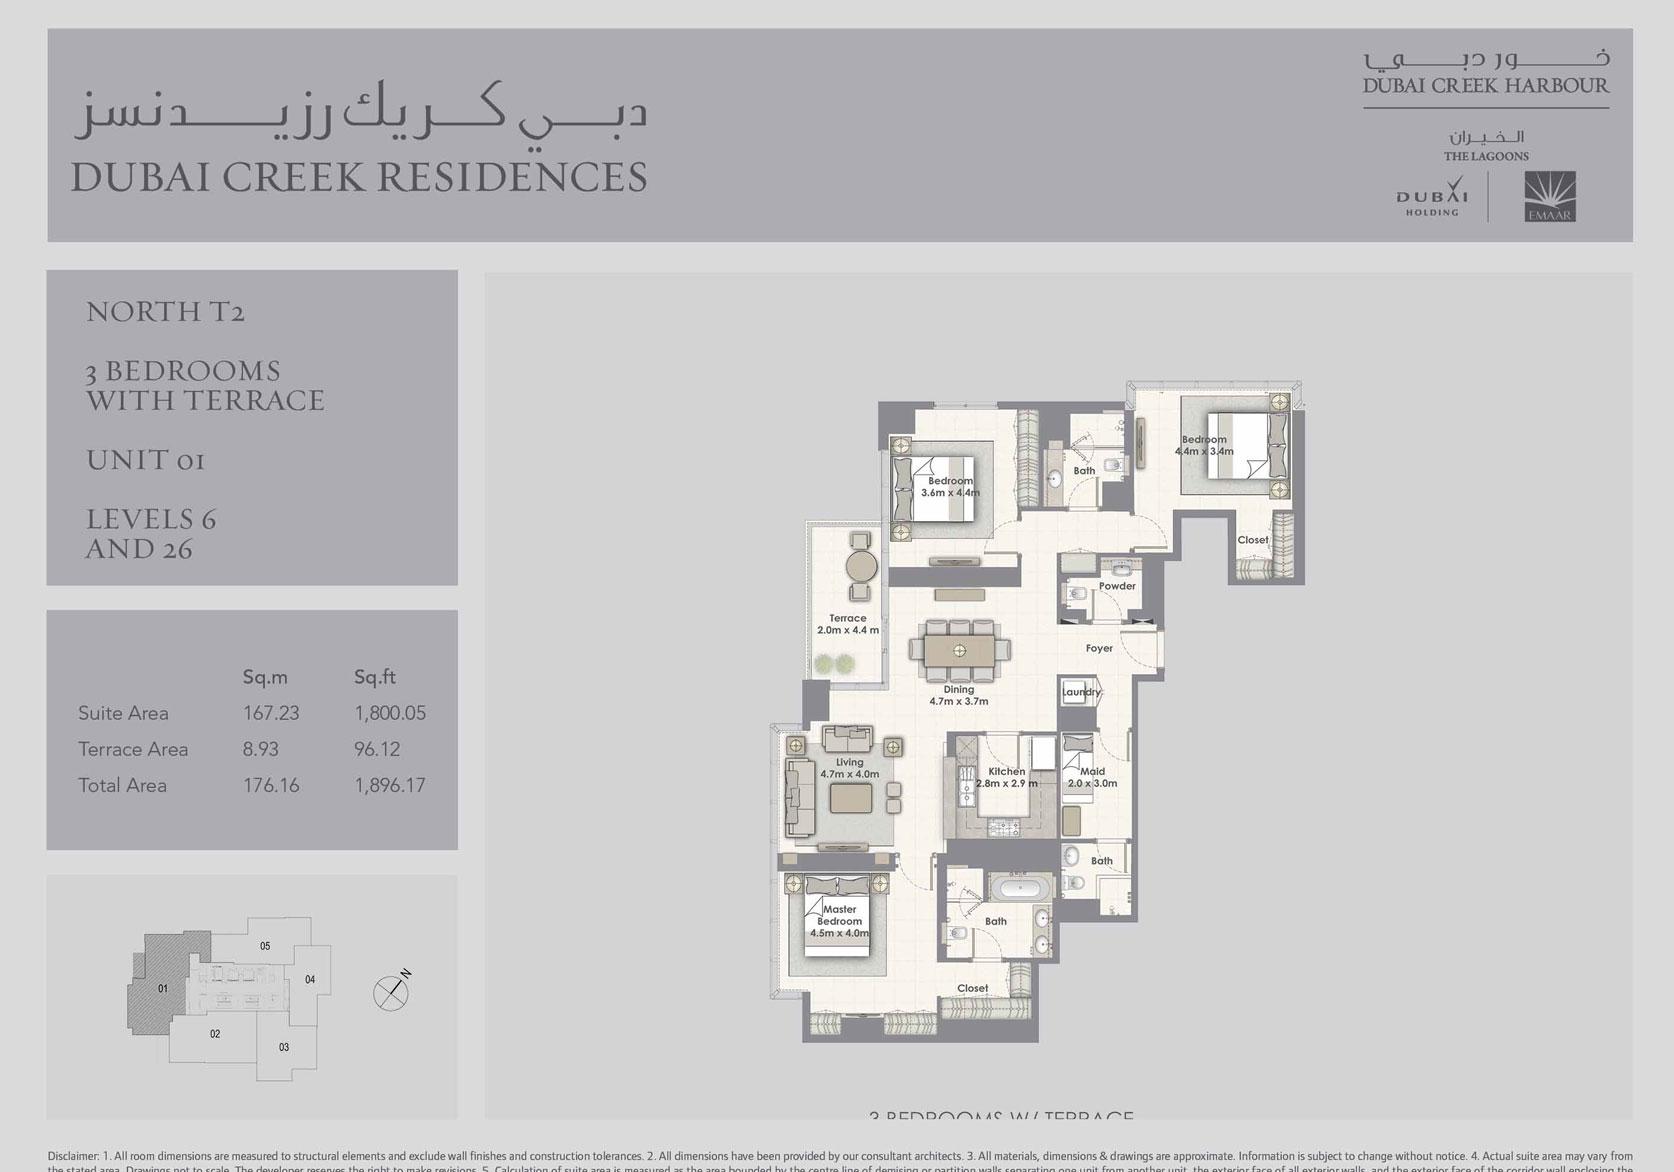 3 Bedroom with Terrace